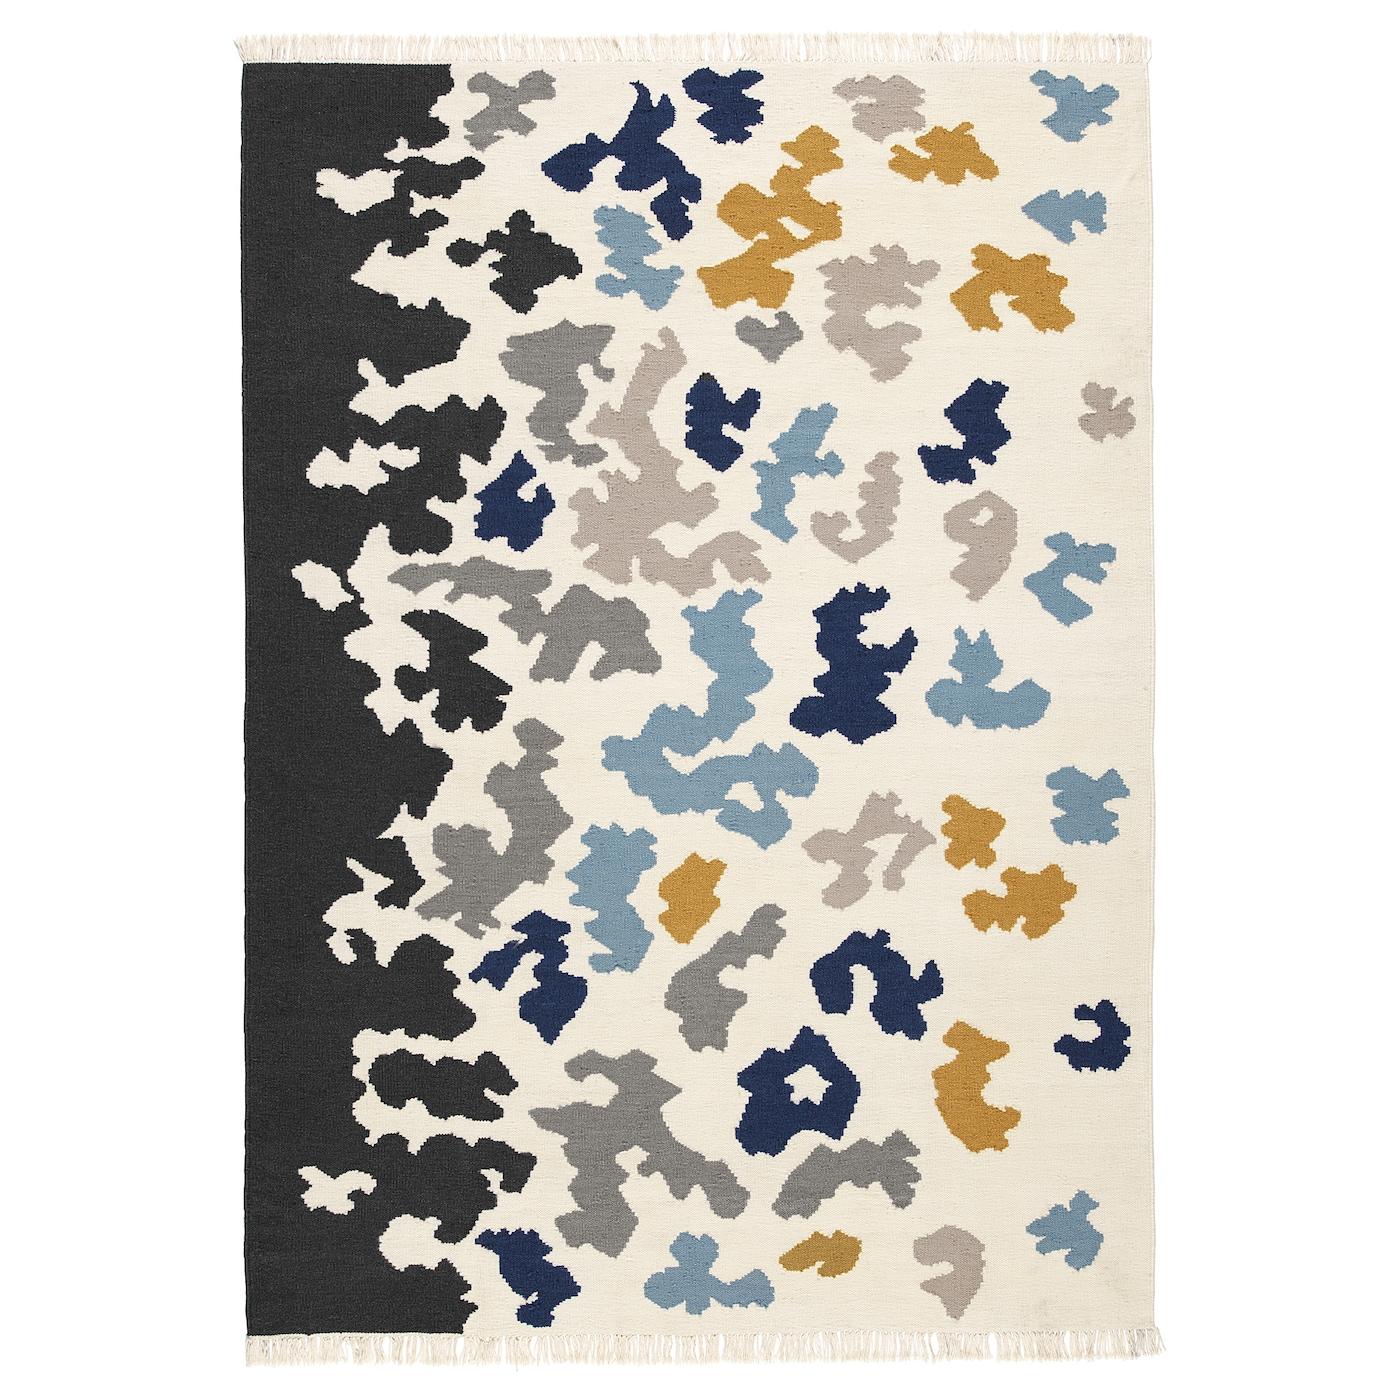 rugs buy rugs online ikea. Black Bedroom Furniture Sets. Home Design Ideas